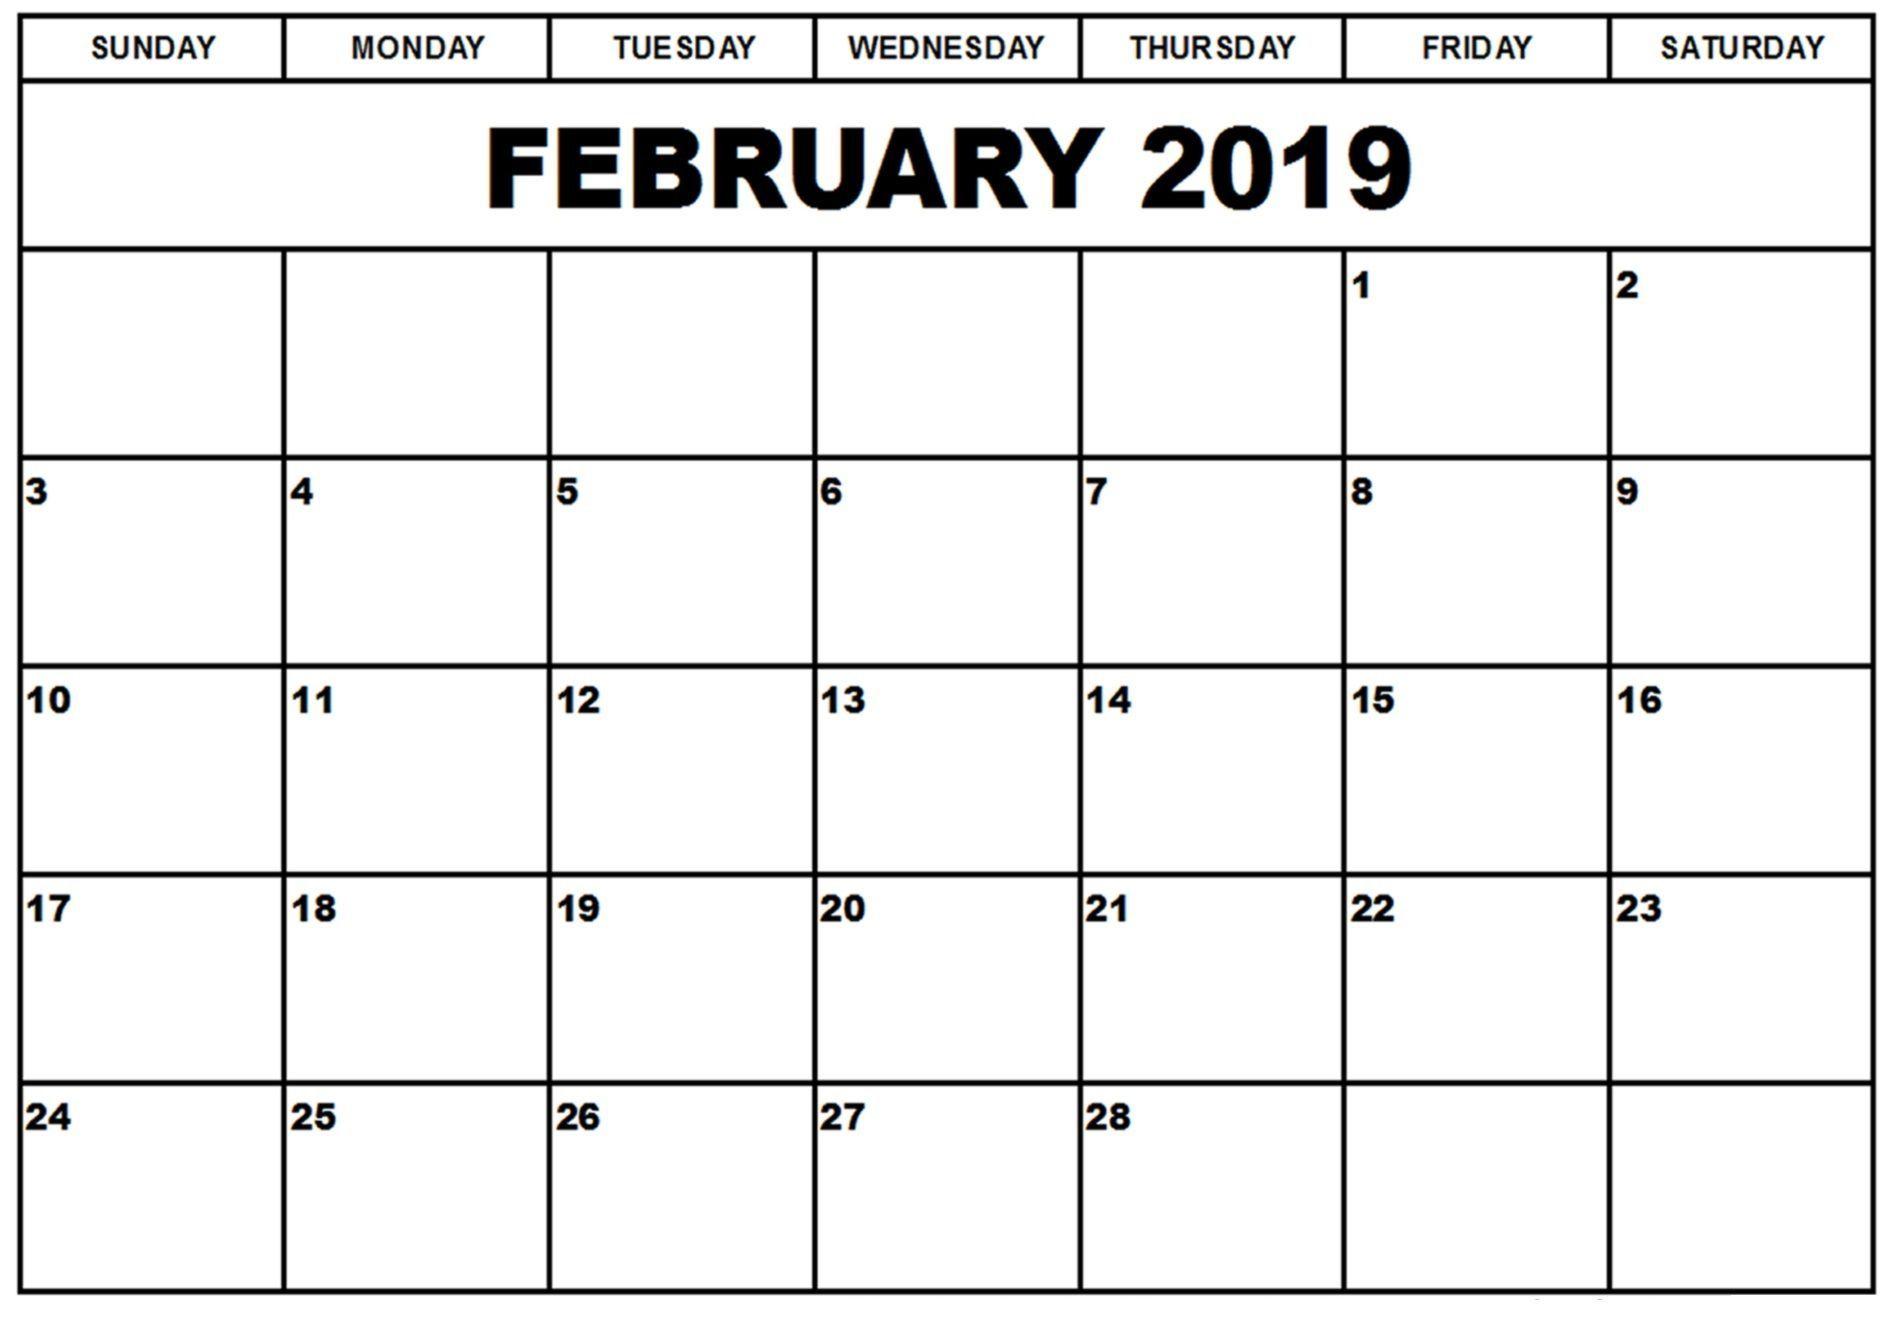 2019 February Printable Word Calendar | Calendar Of February 2019 throughout Vetex 2020 Word Calendar Download